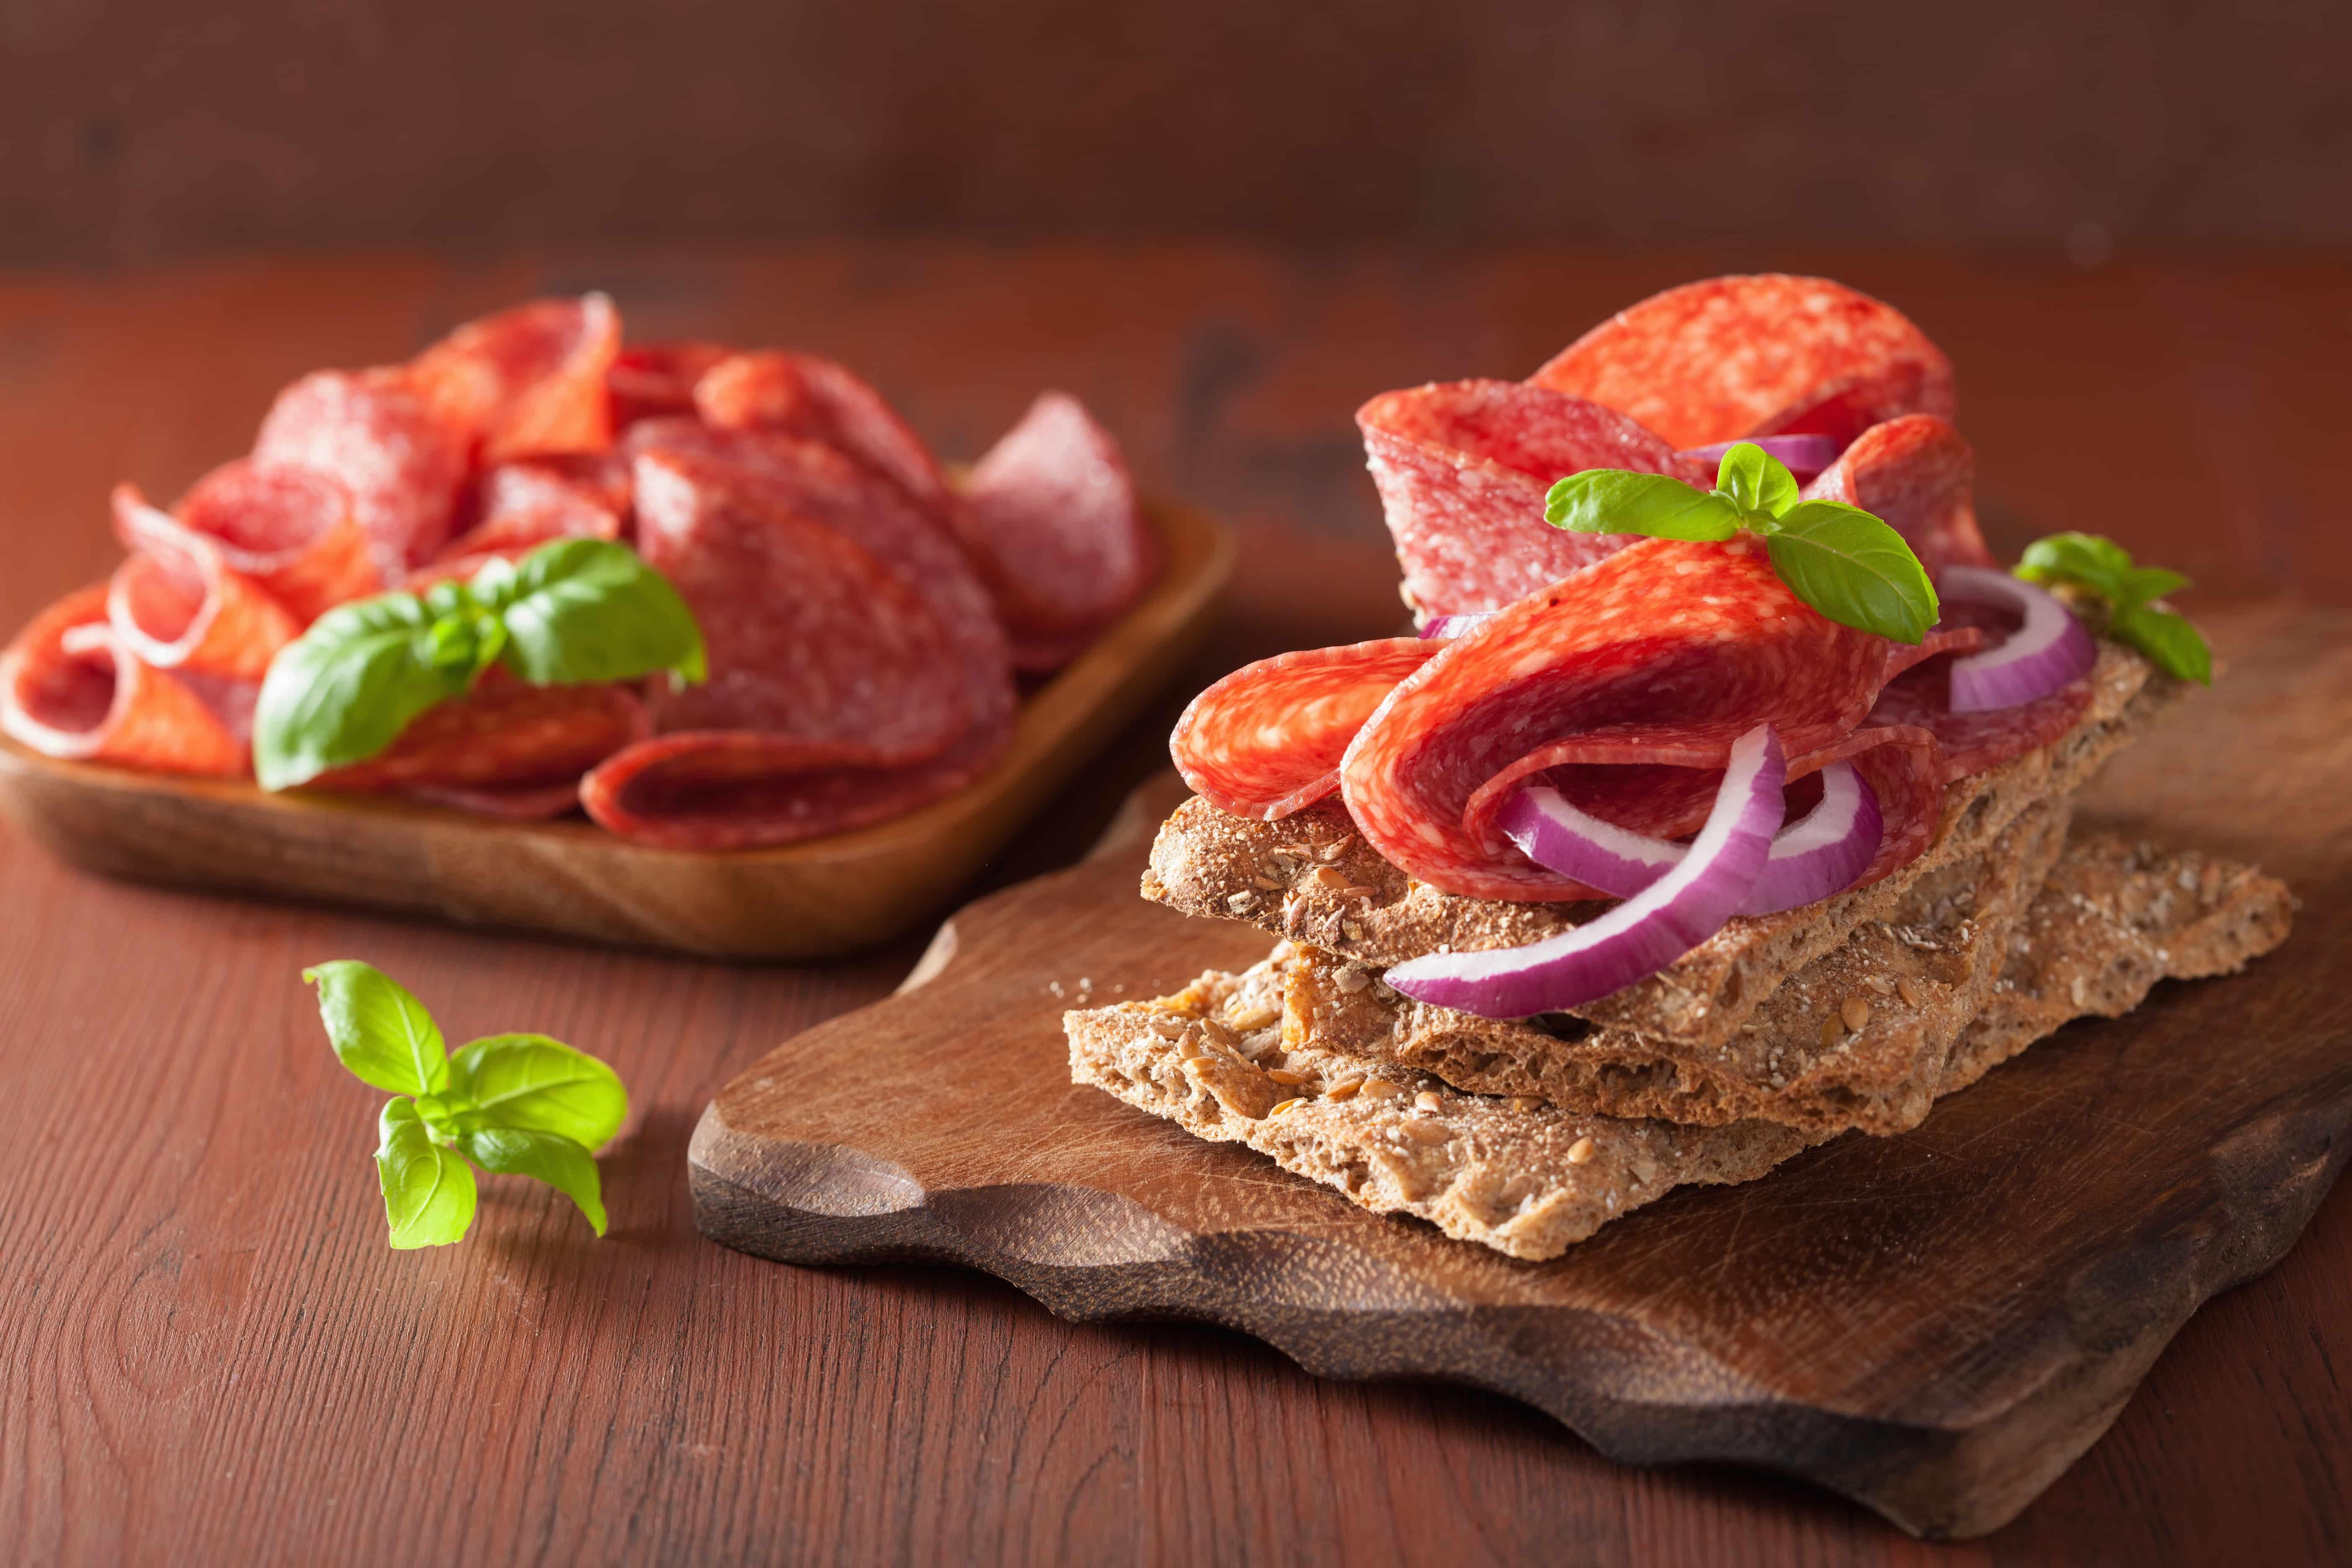 Cracker vs. Brood image